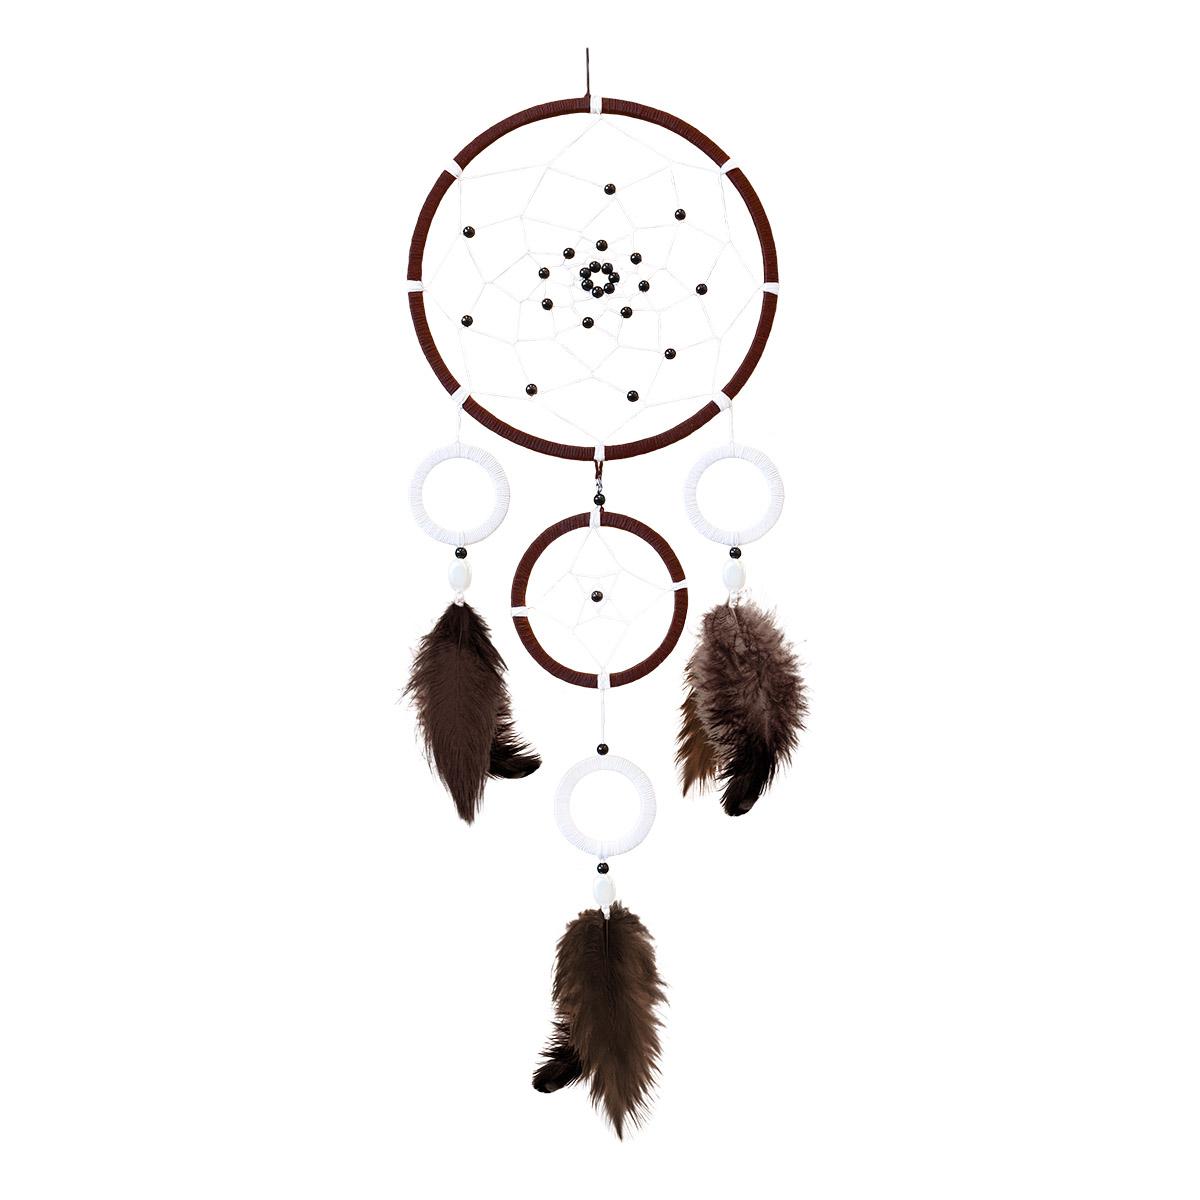 ЛС-02 Набор для творчества Созвездие 'Агат'(ловец снов)15х42,5 см